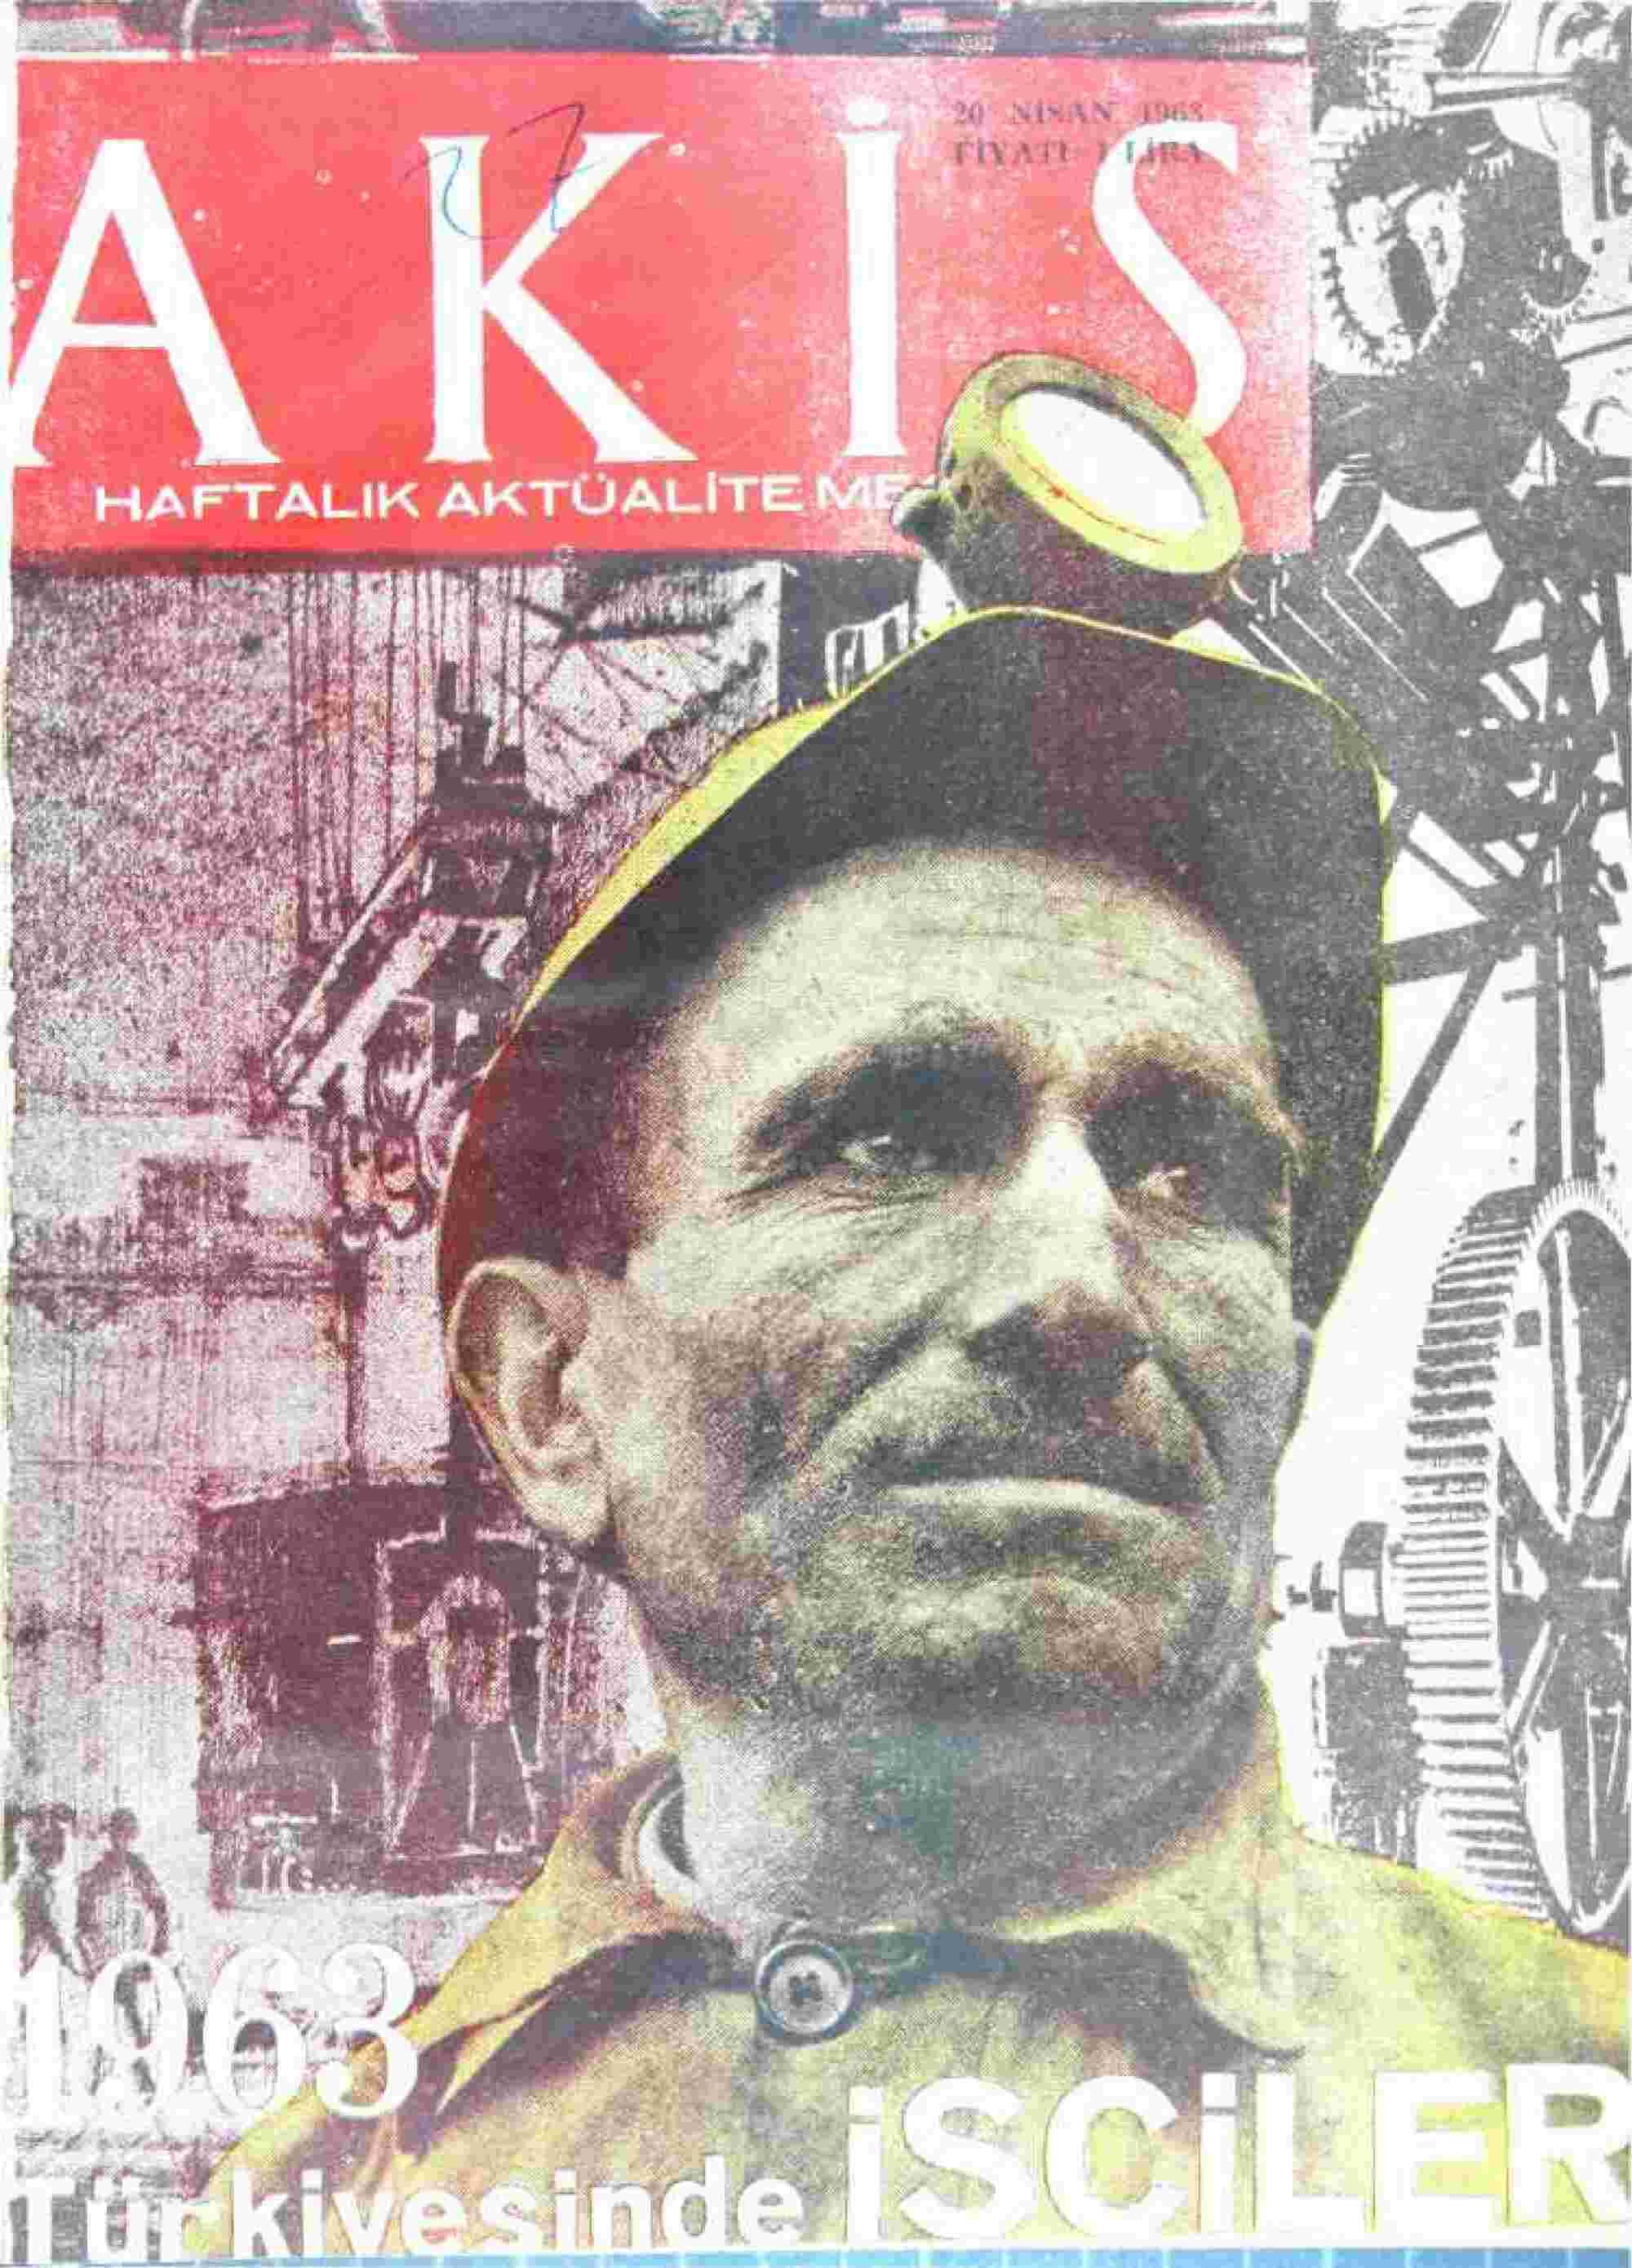 20 Nisan 1963 Tarihli Akis Dergisi Sayfa 1